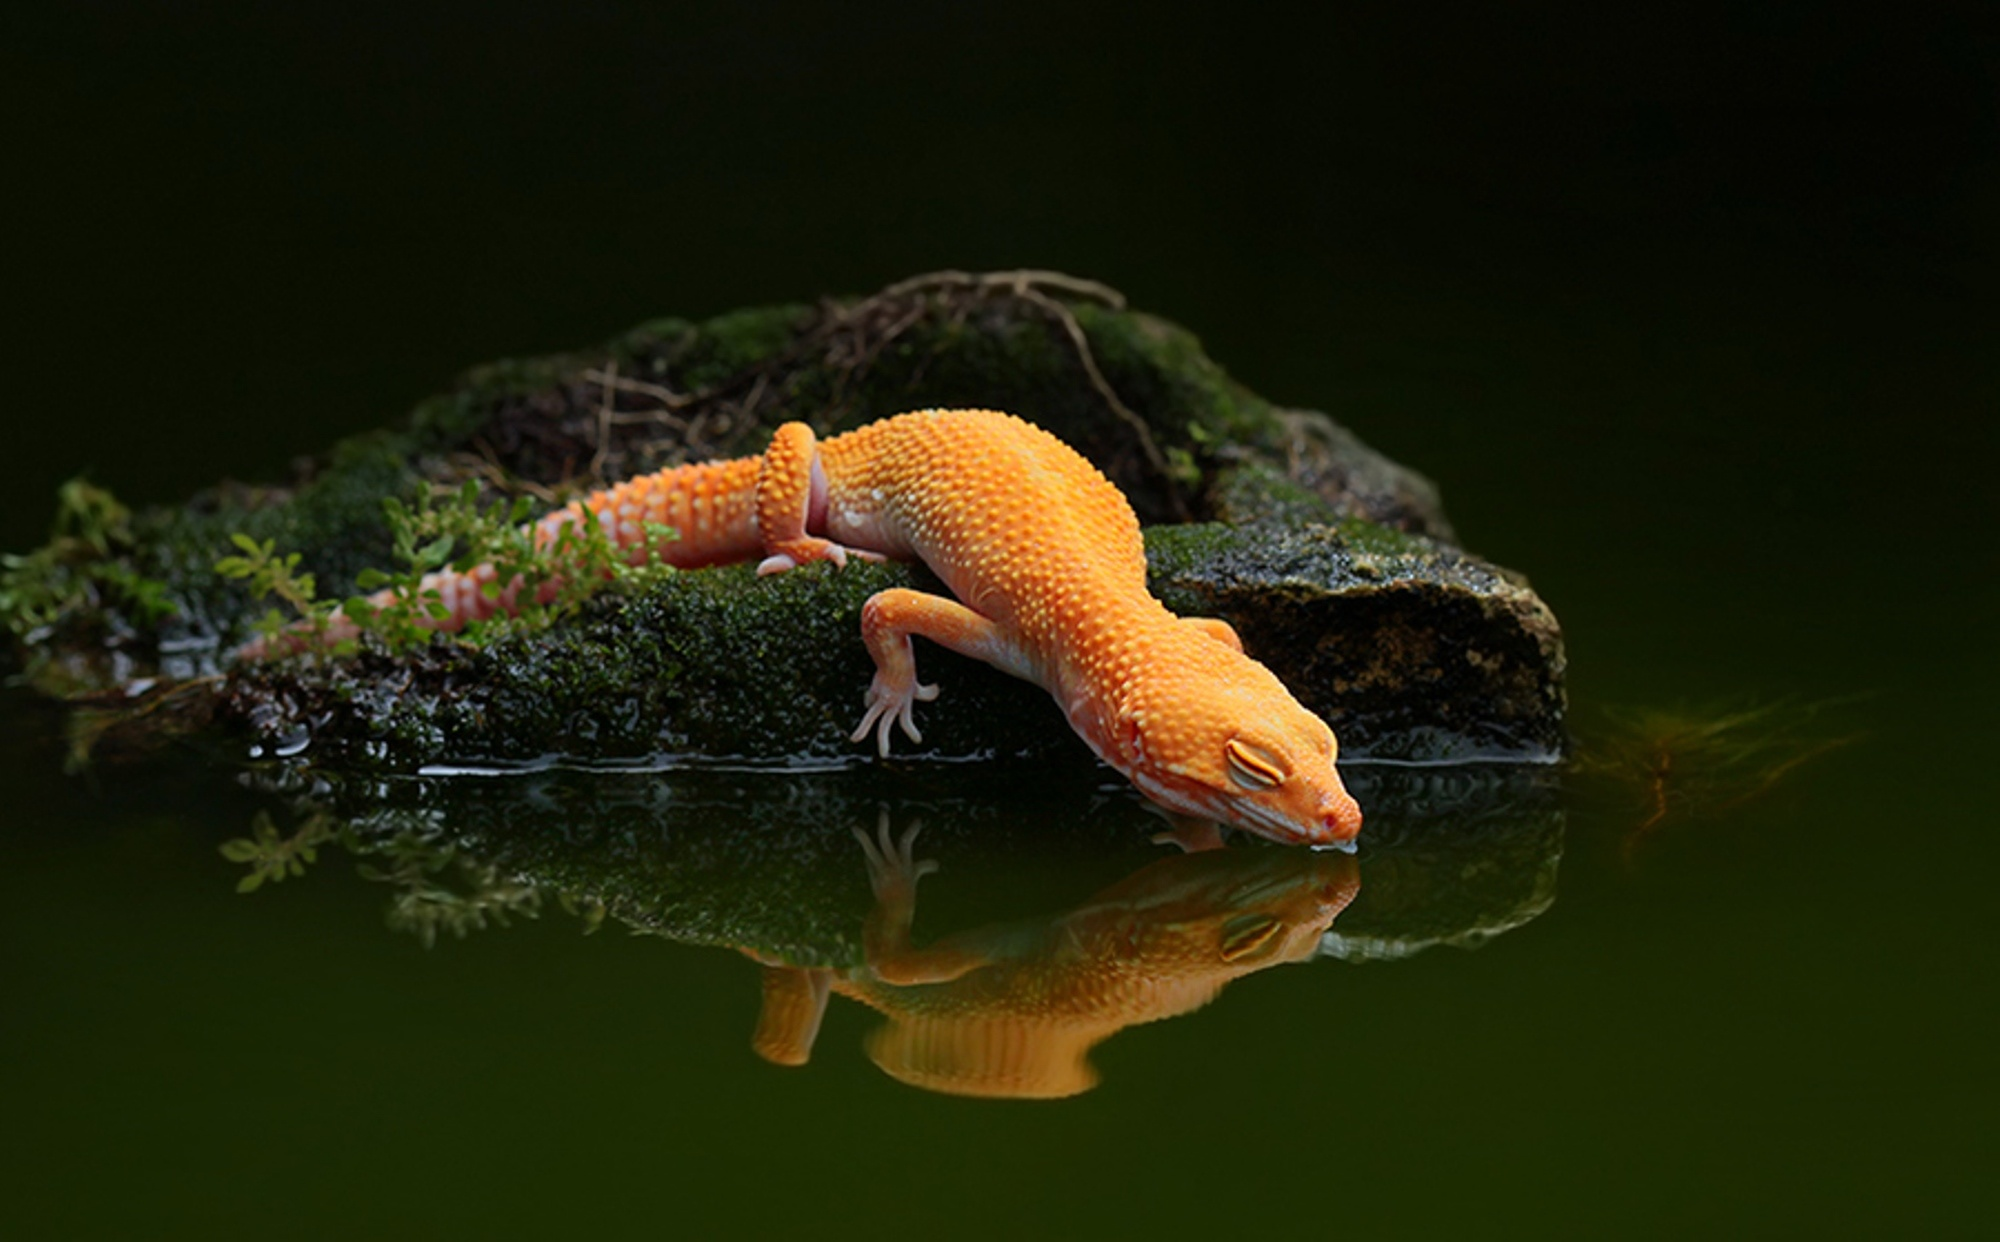 lizard Water Reflection Water Gecko Wallpapers HD Desktop 2000x1242